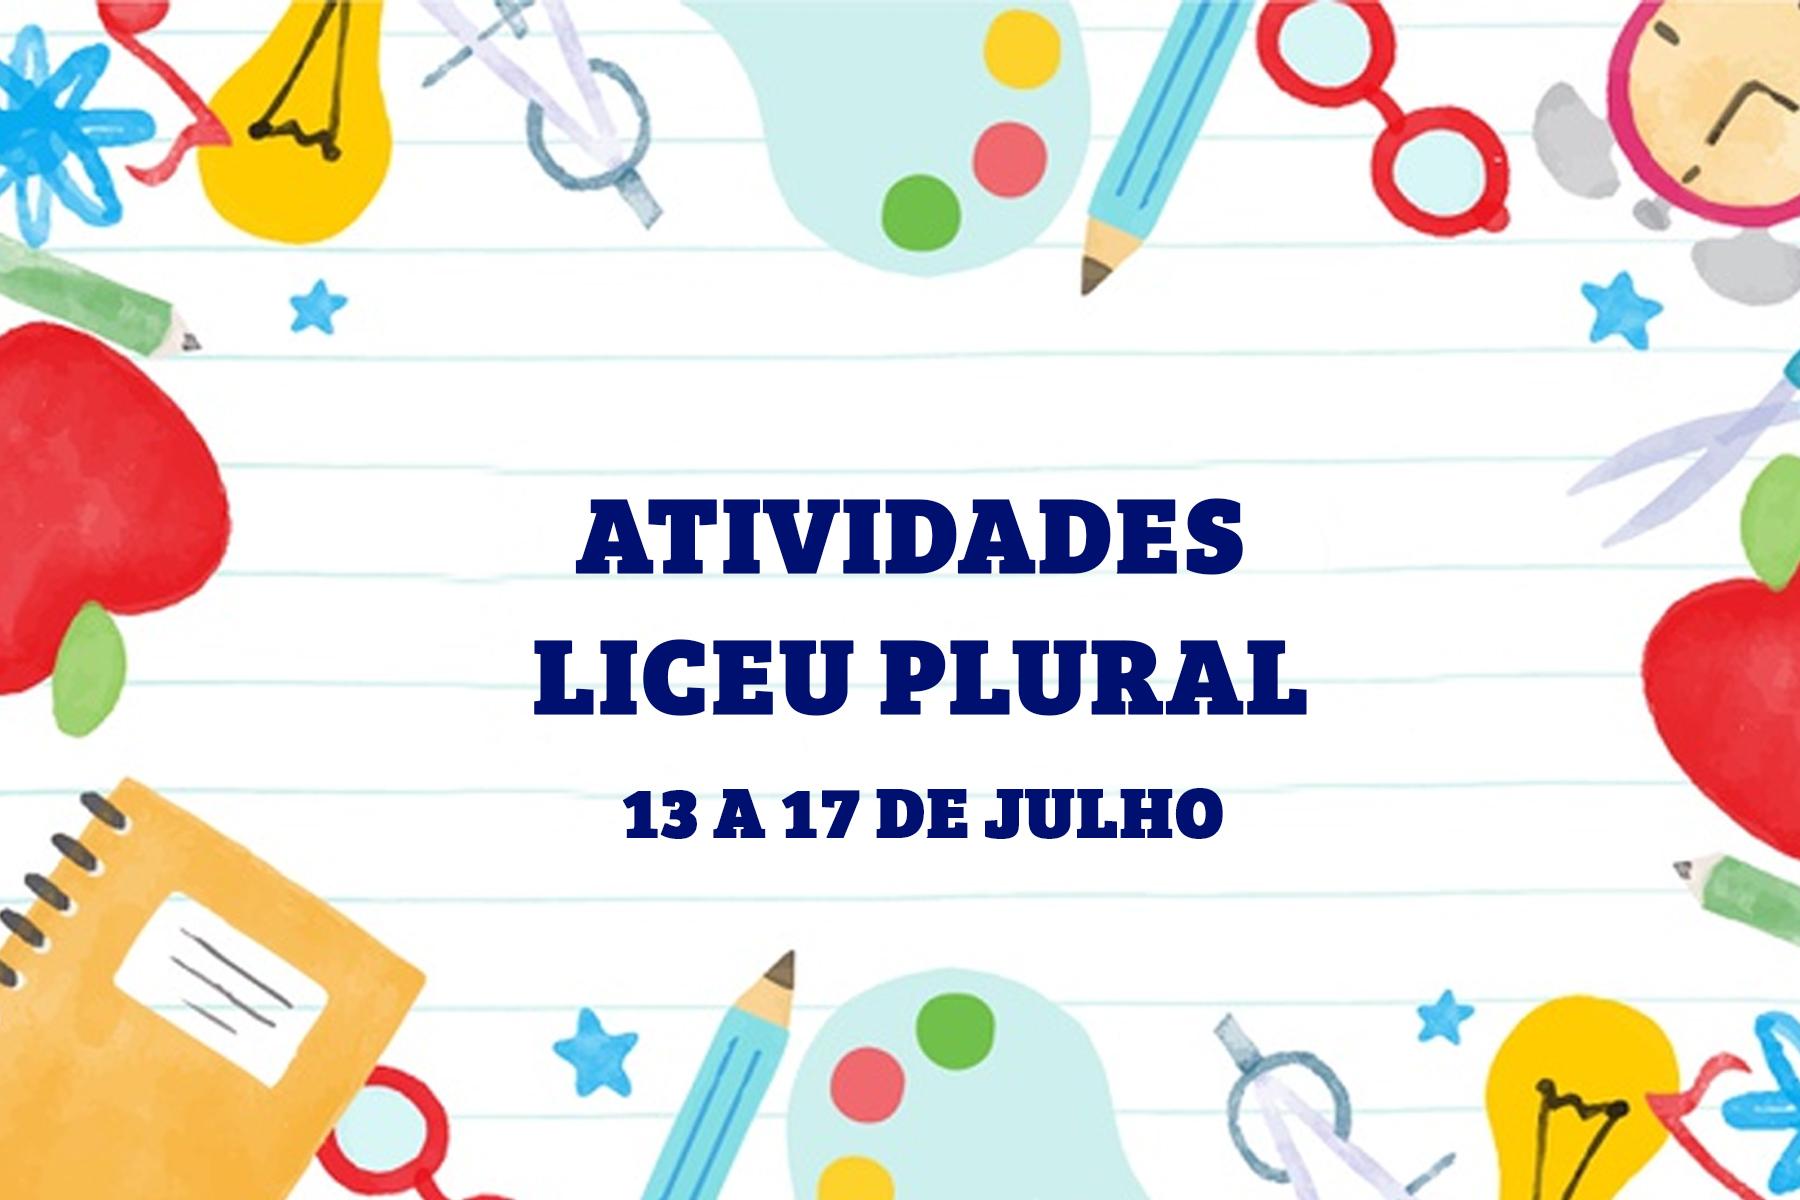 ATIVIDADES | LICEU PLURAL – 13 A 17 DE JULHO